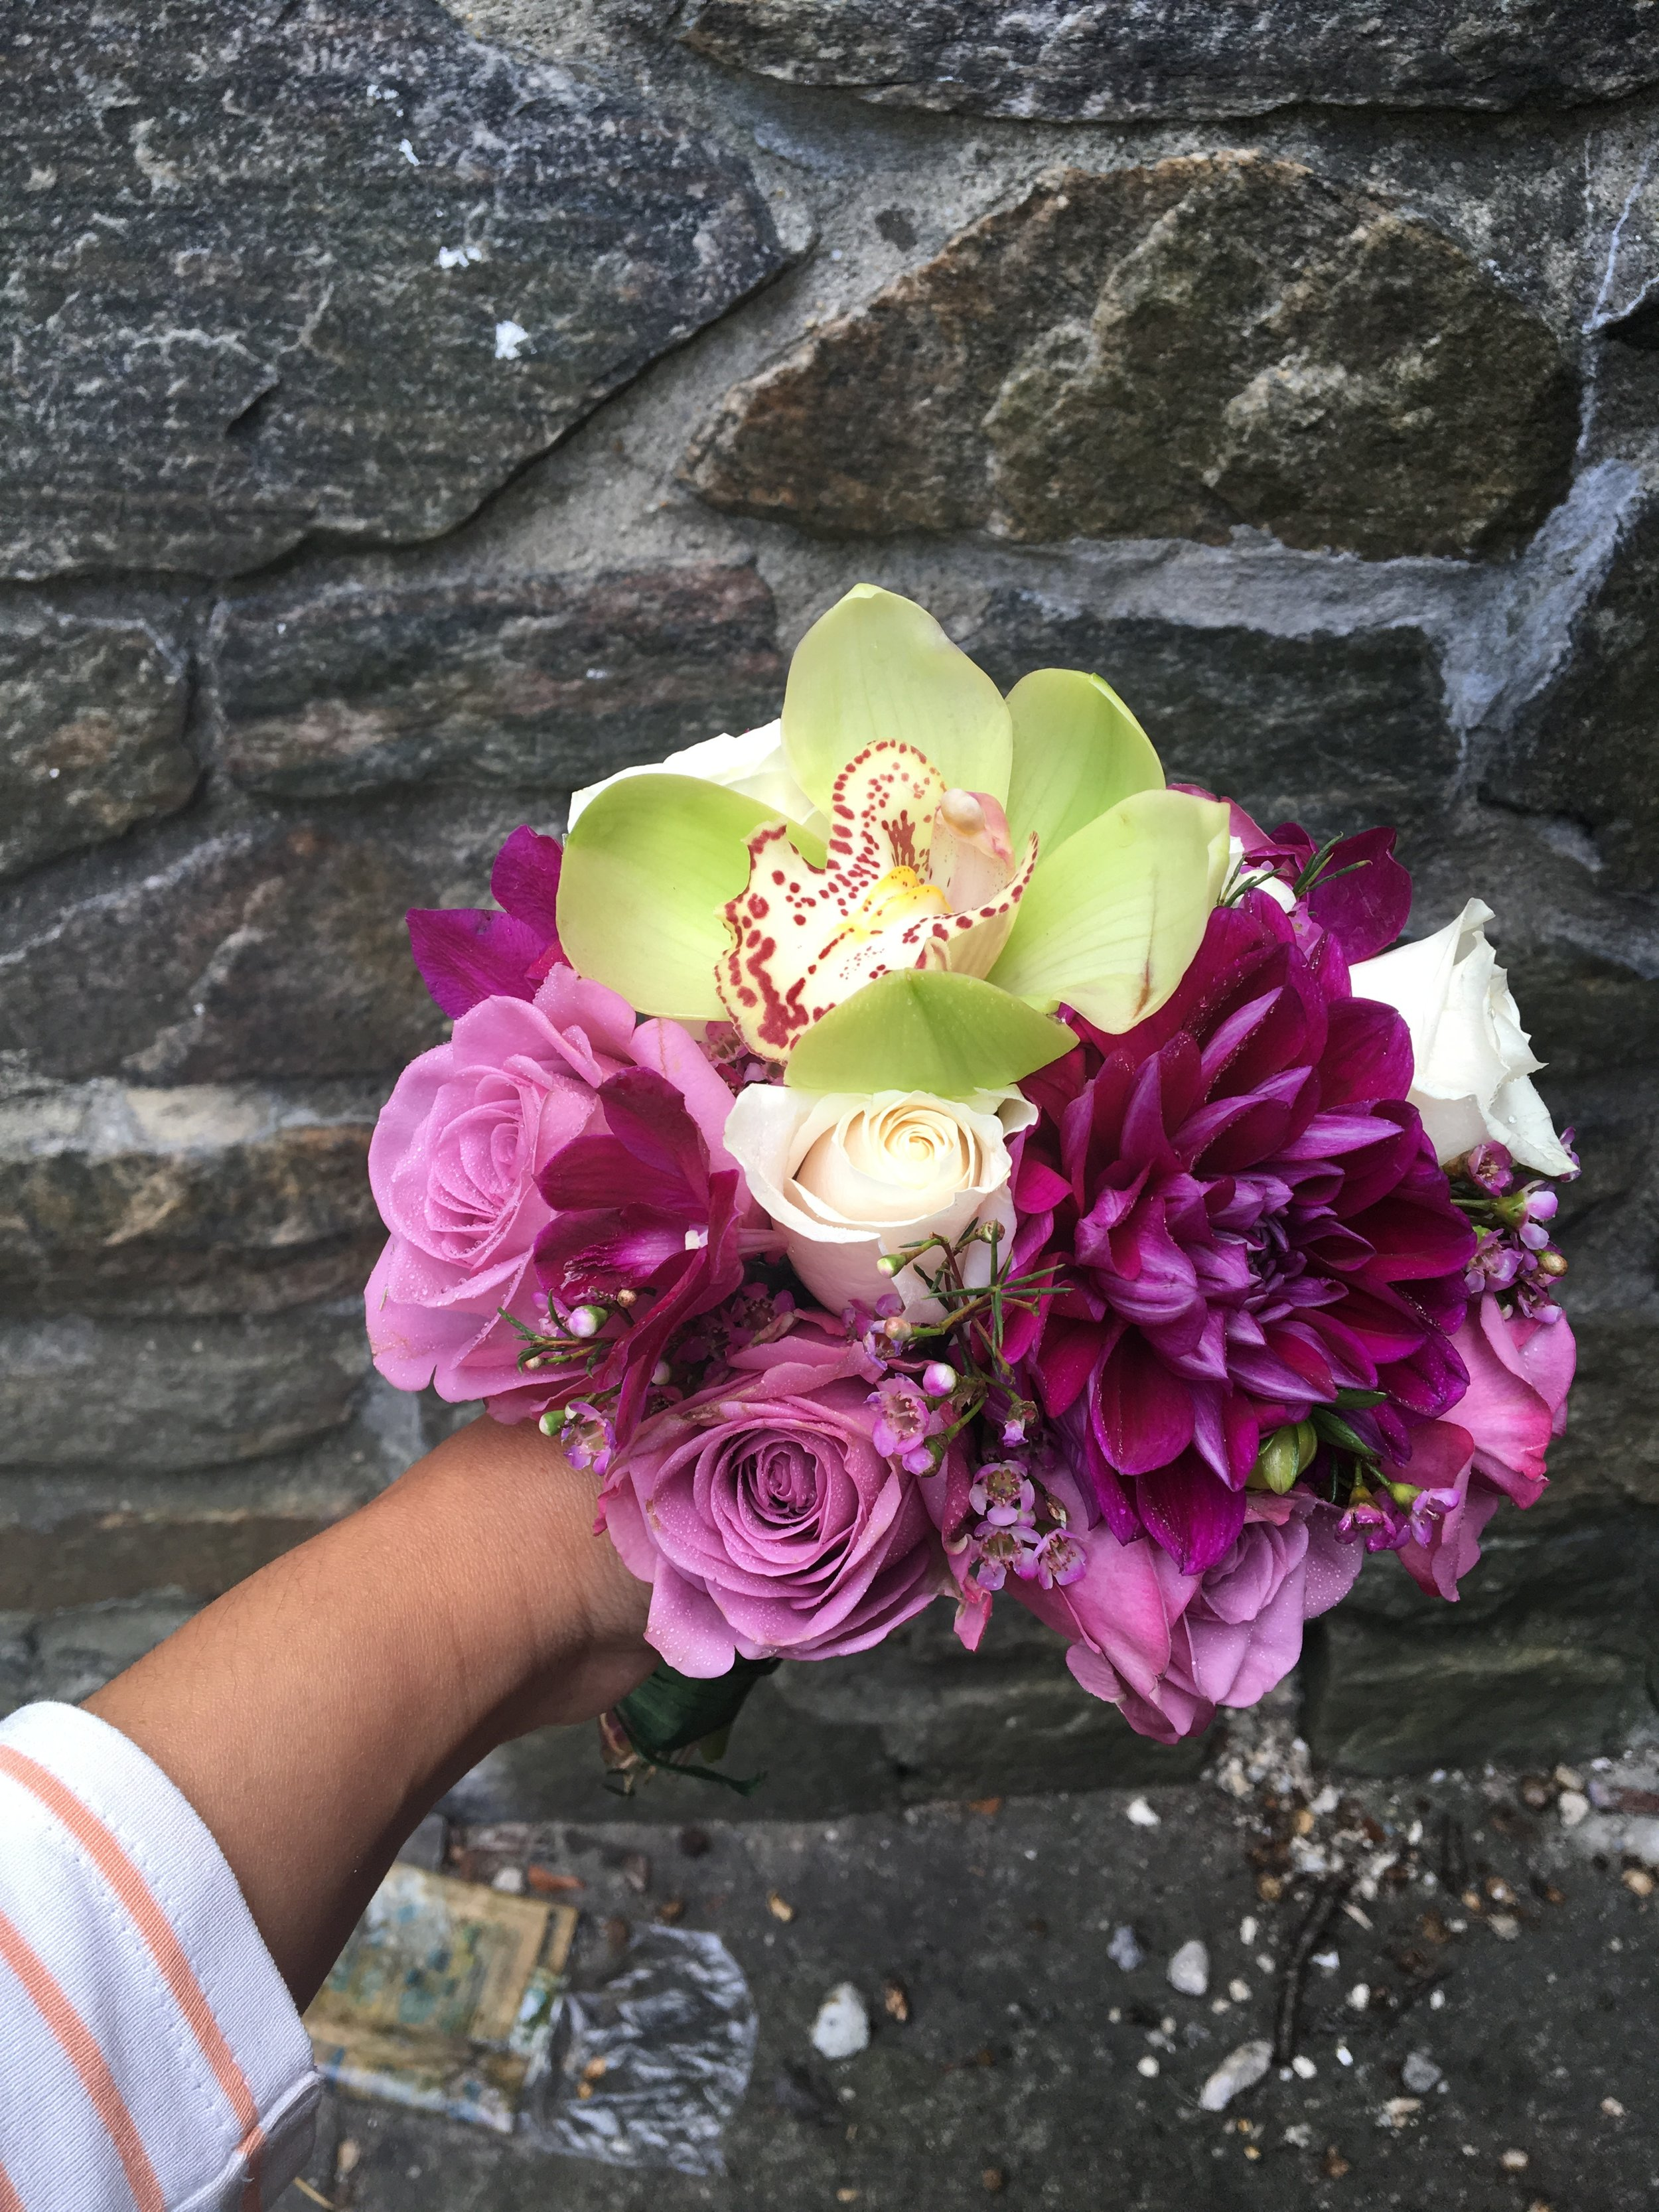 Evelisa Floral & Design: Bridesmaid's bouquet